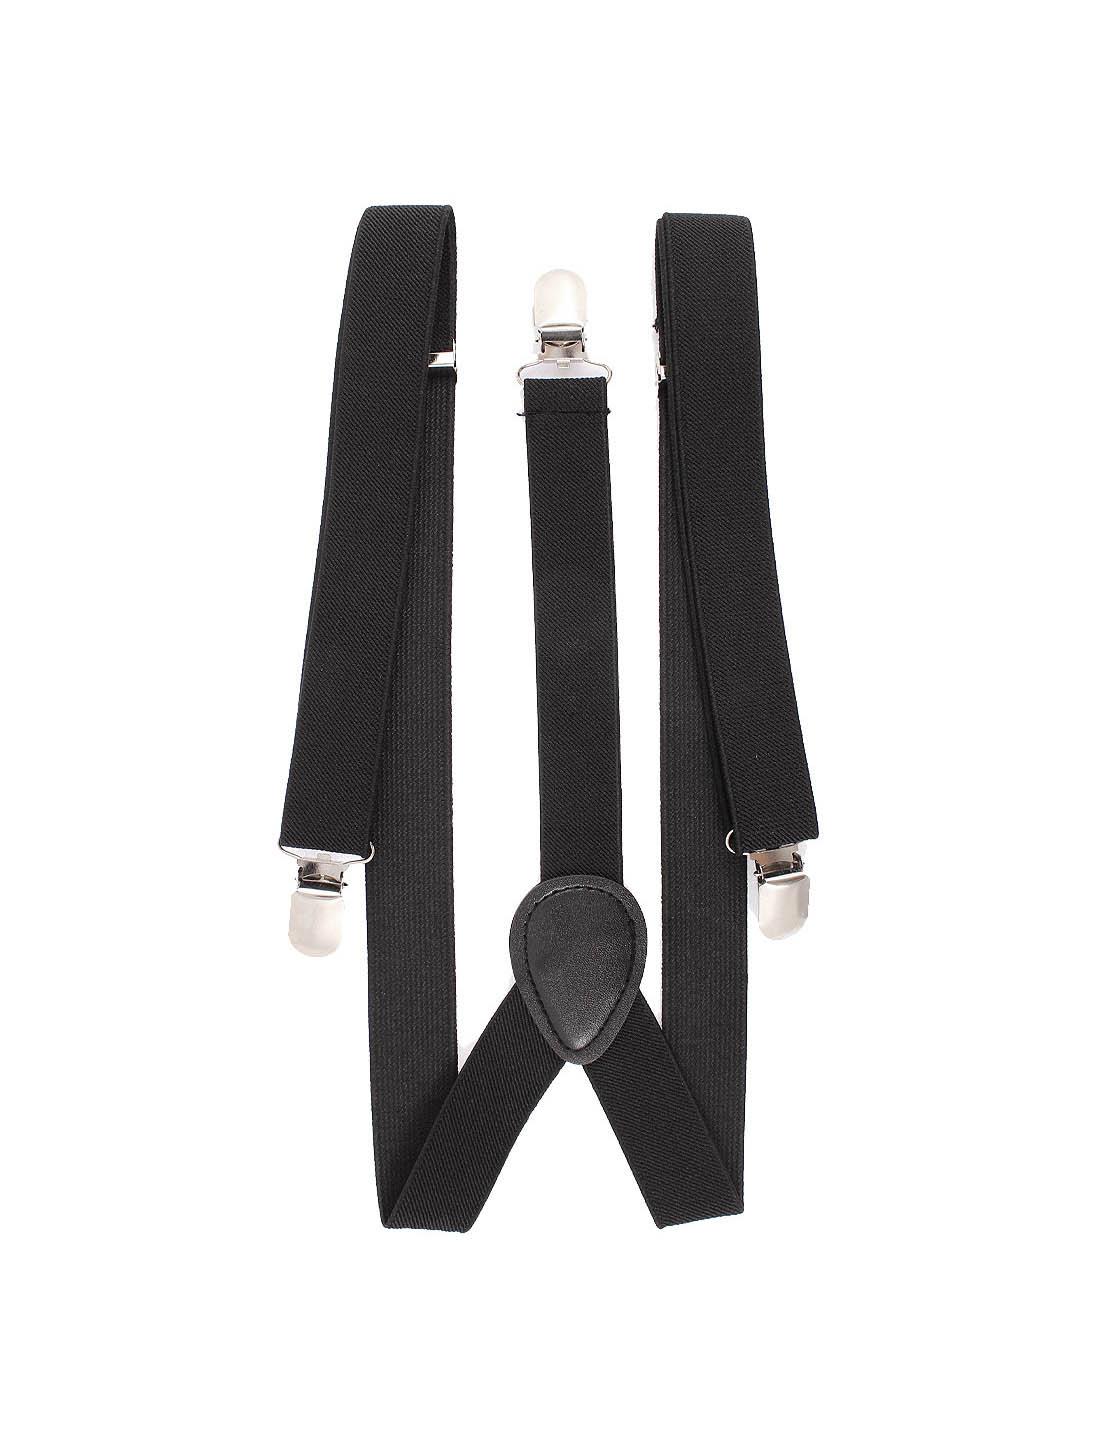 Elastic Fibre Metal Clamp Y Shape Adjustable Suspenders Braces Black